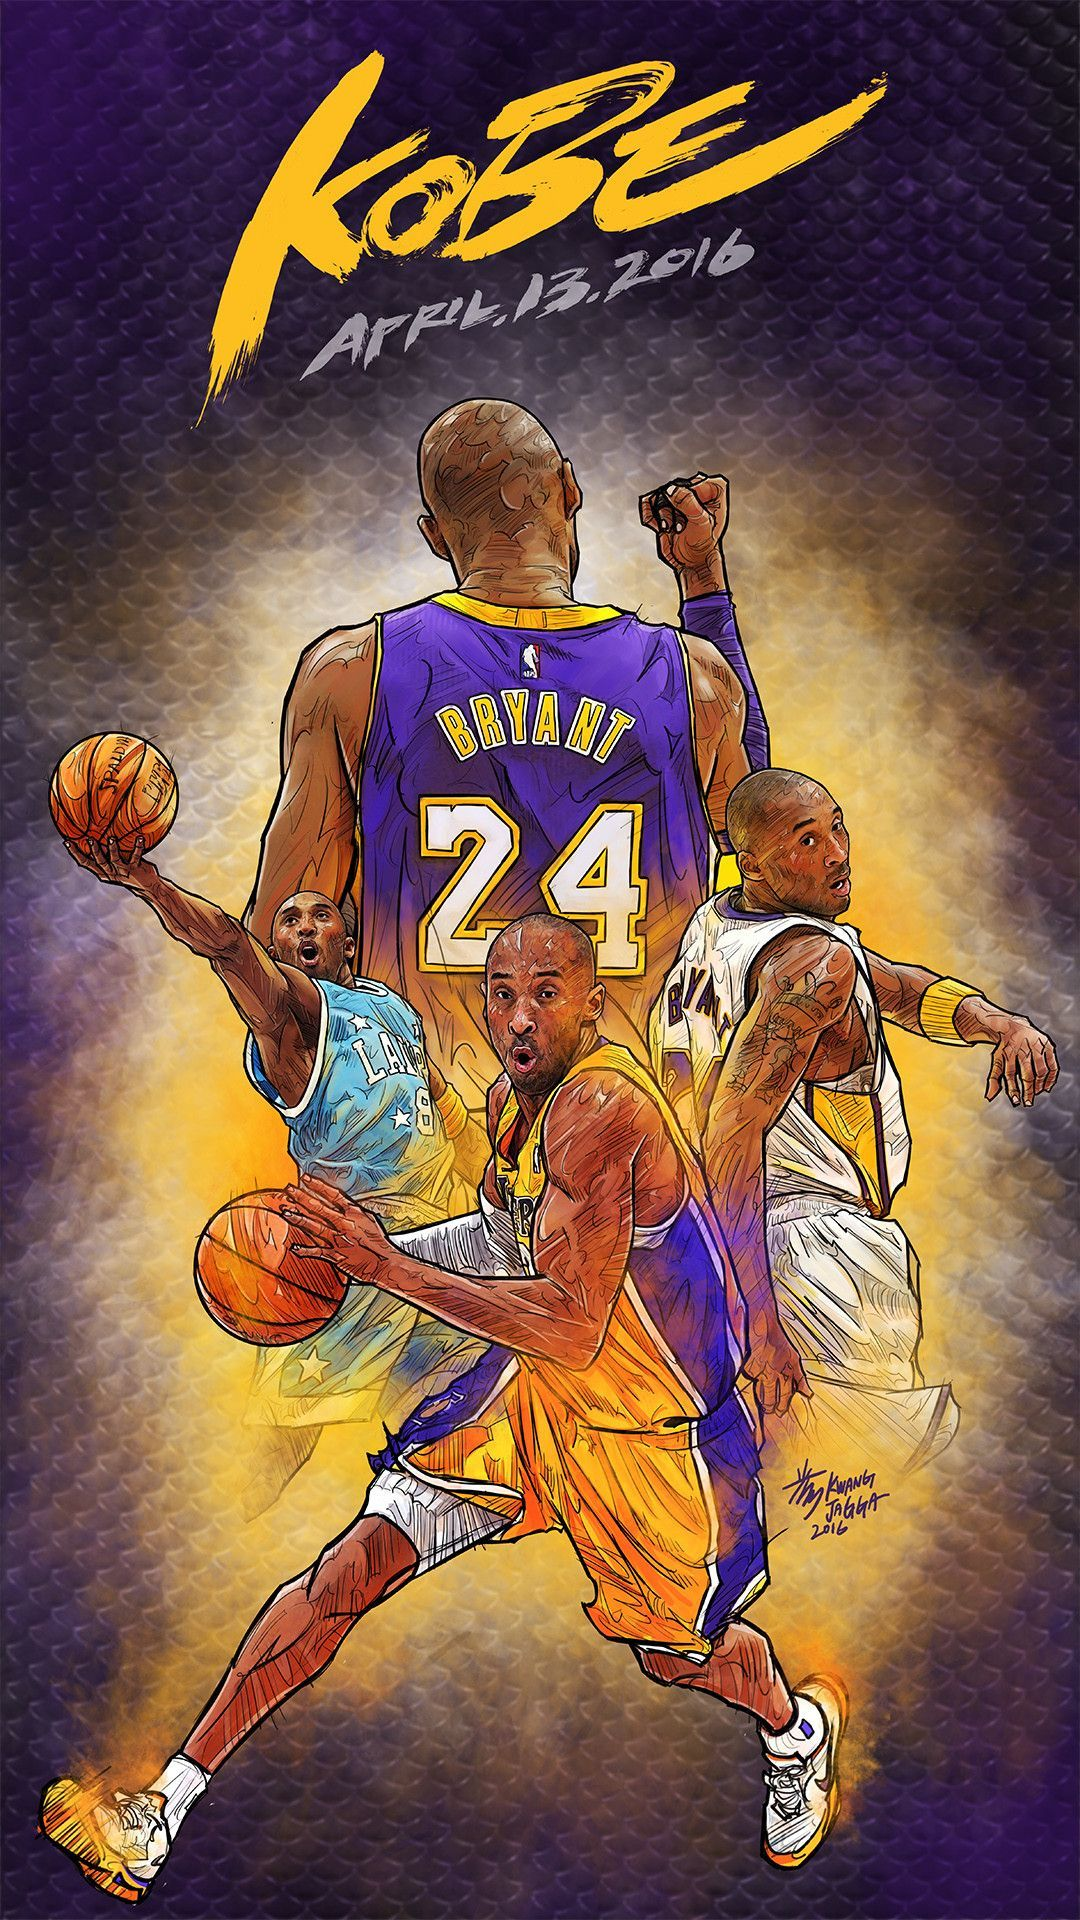 Animated Kobe Bryant Wallpaper : animated, bryant, wallpaper, Cartoon, Wallpapers, Backgrounds, WallpaperAccess